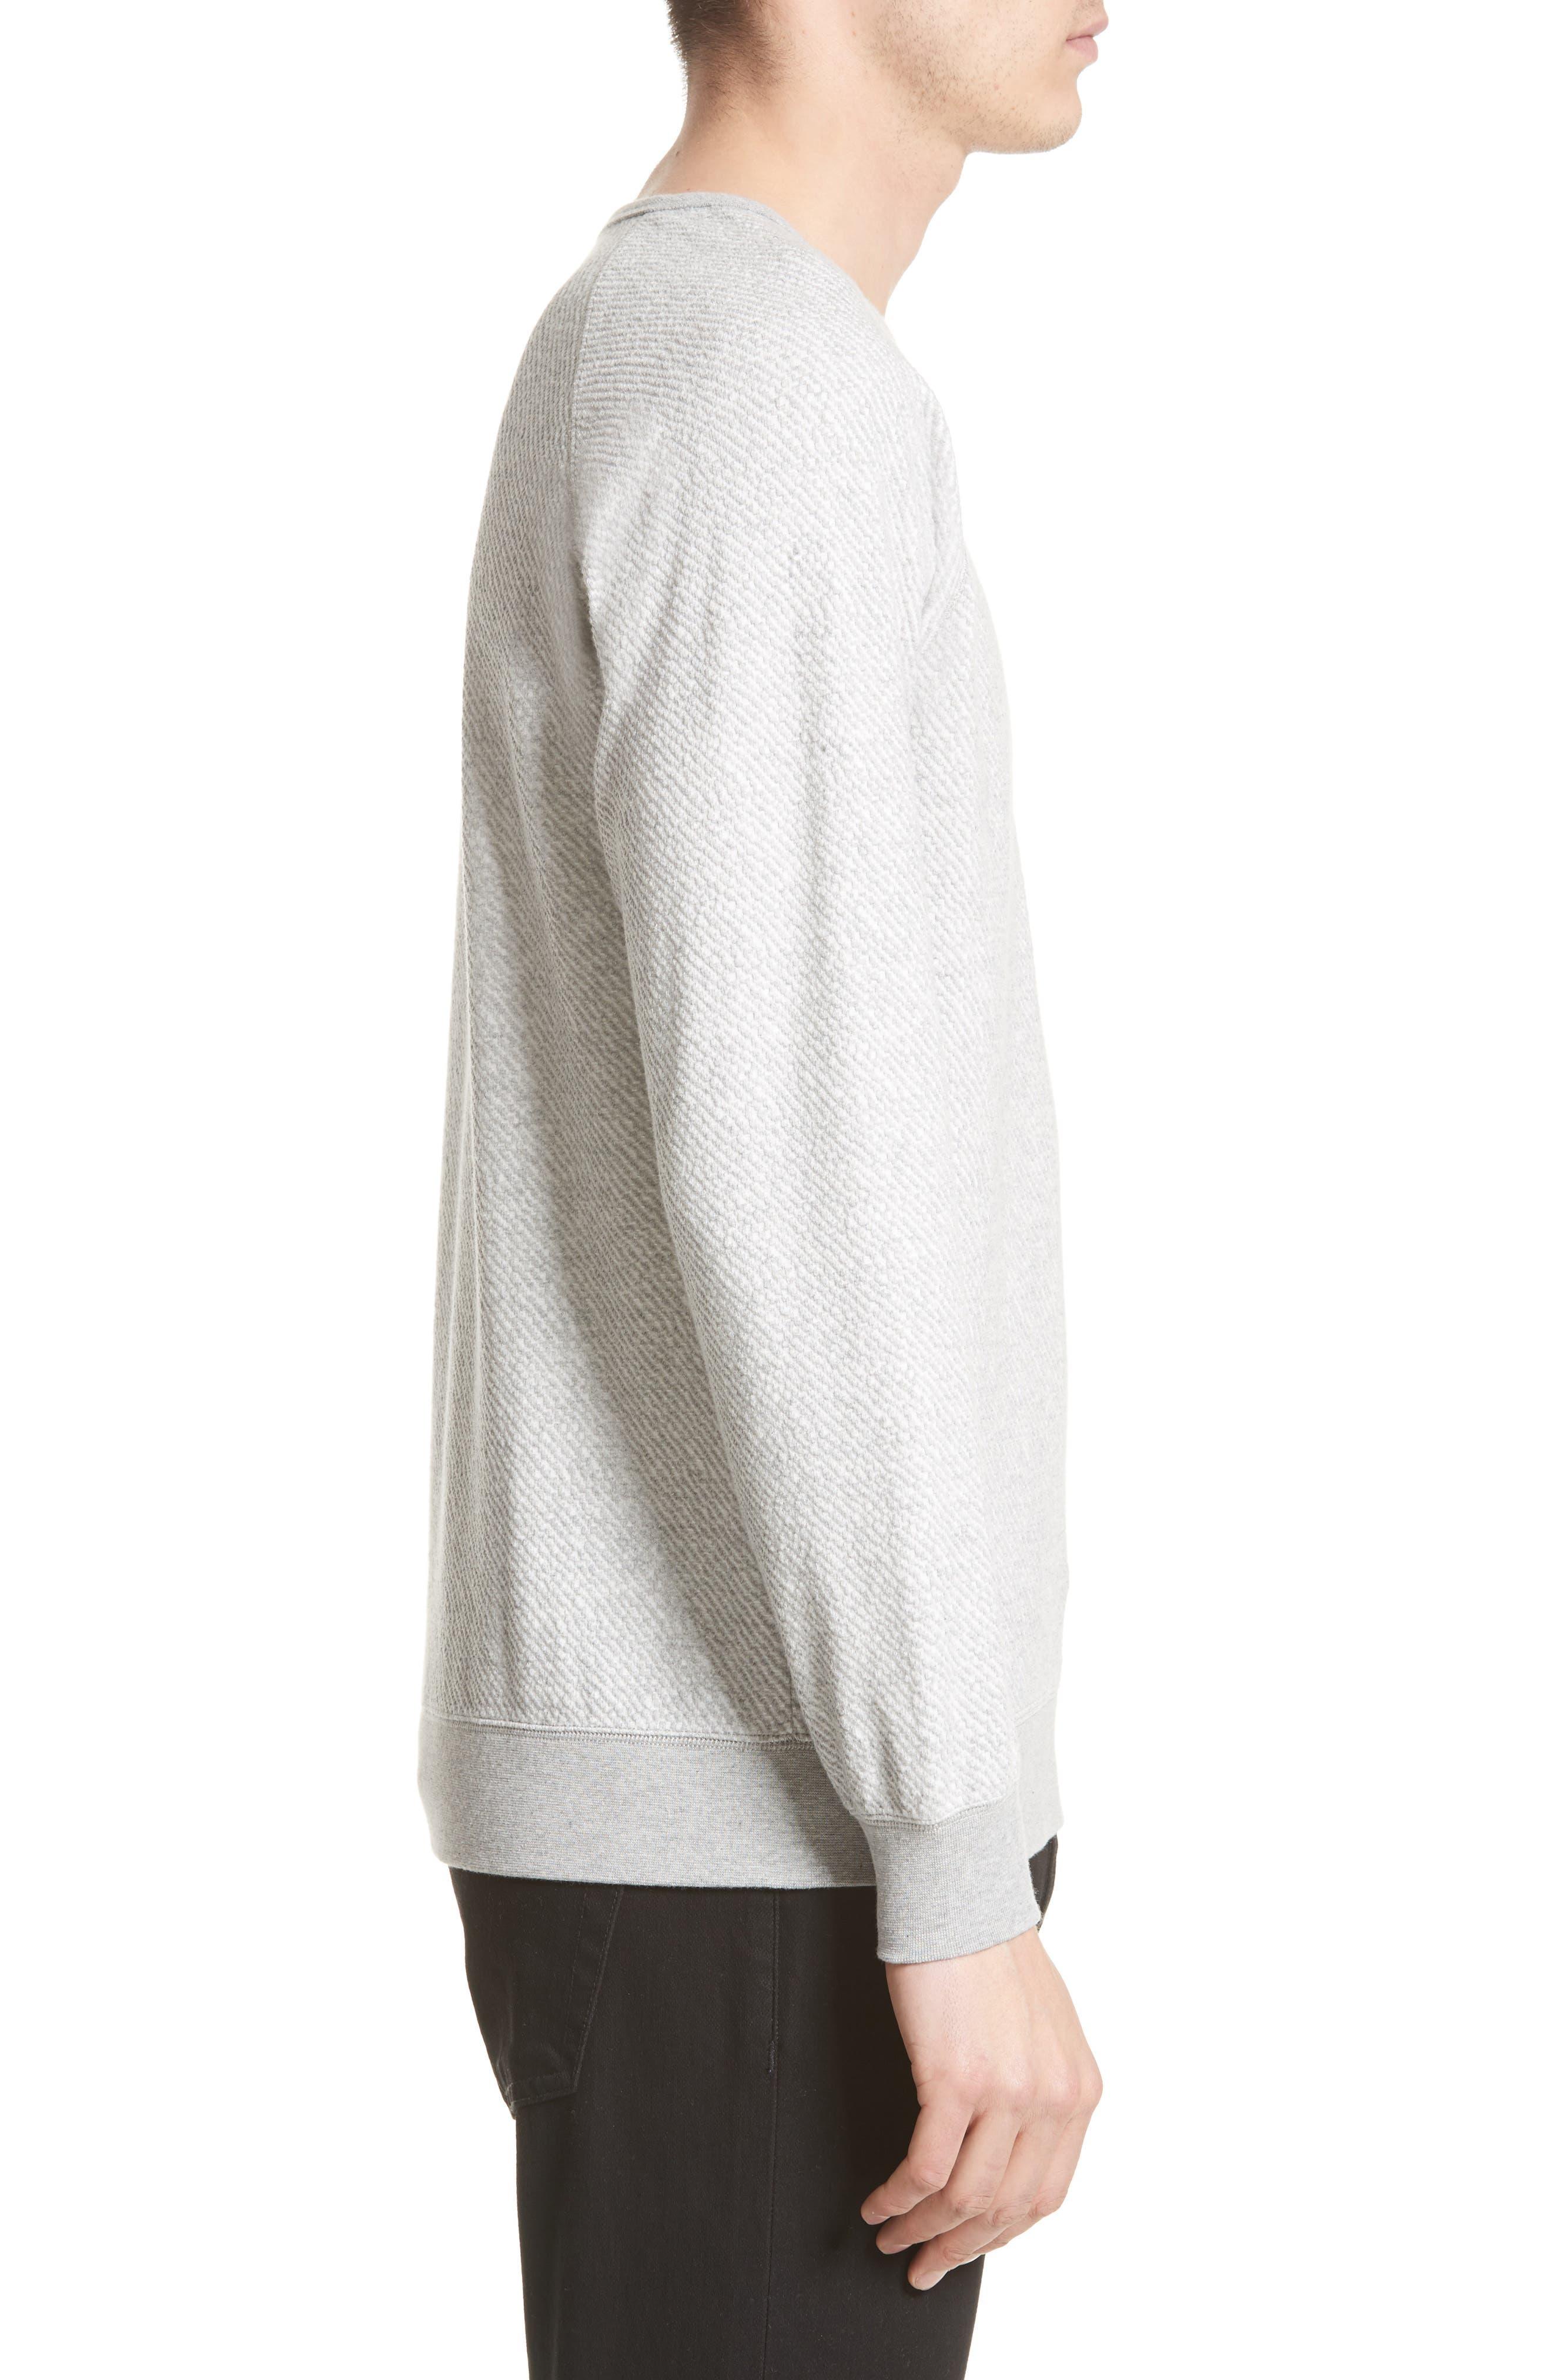 Kasu Sweater,                             Alternate thumbnail 3, color,                             035